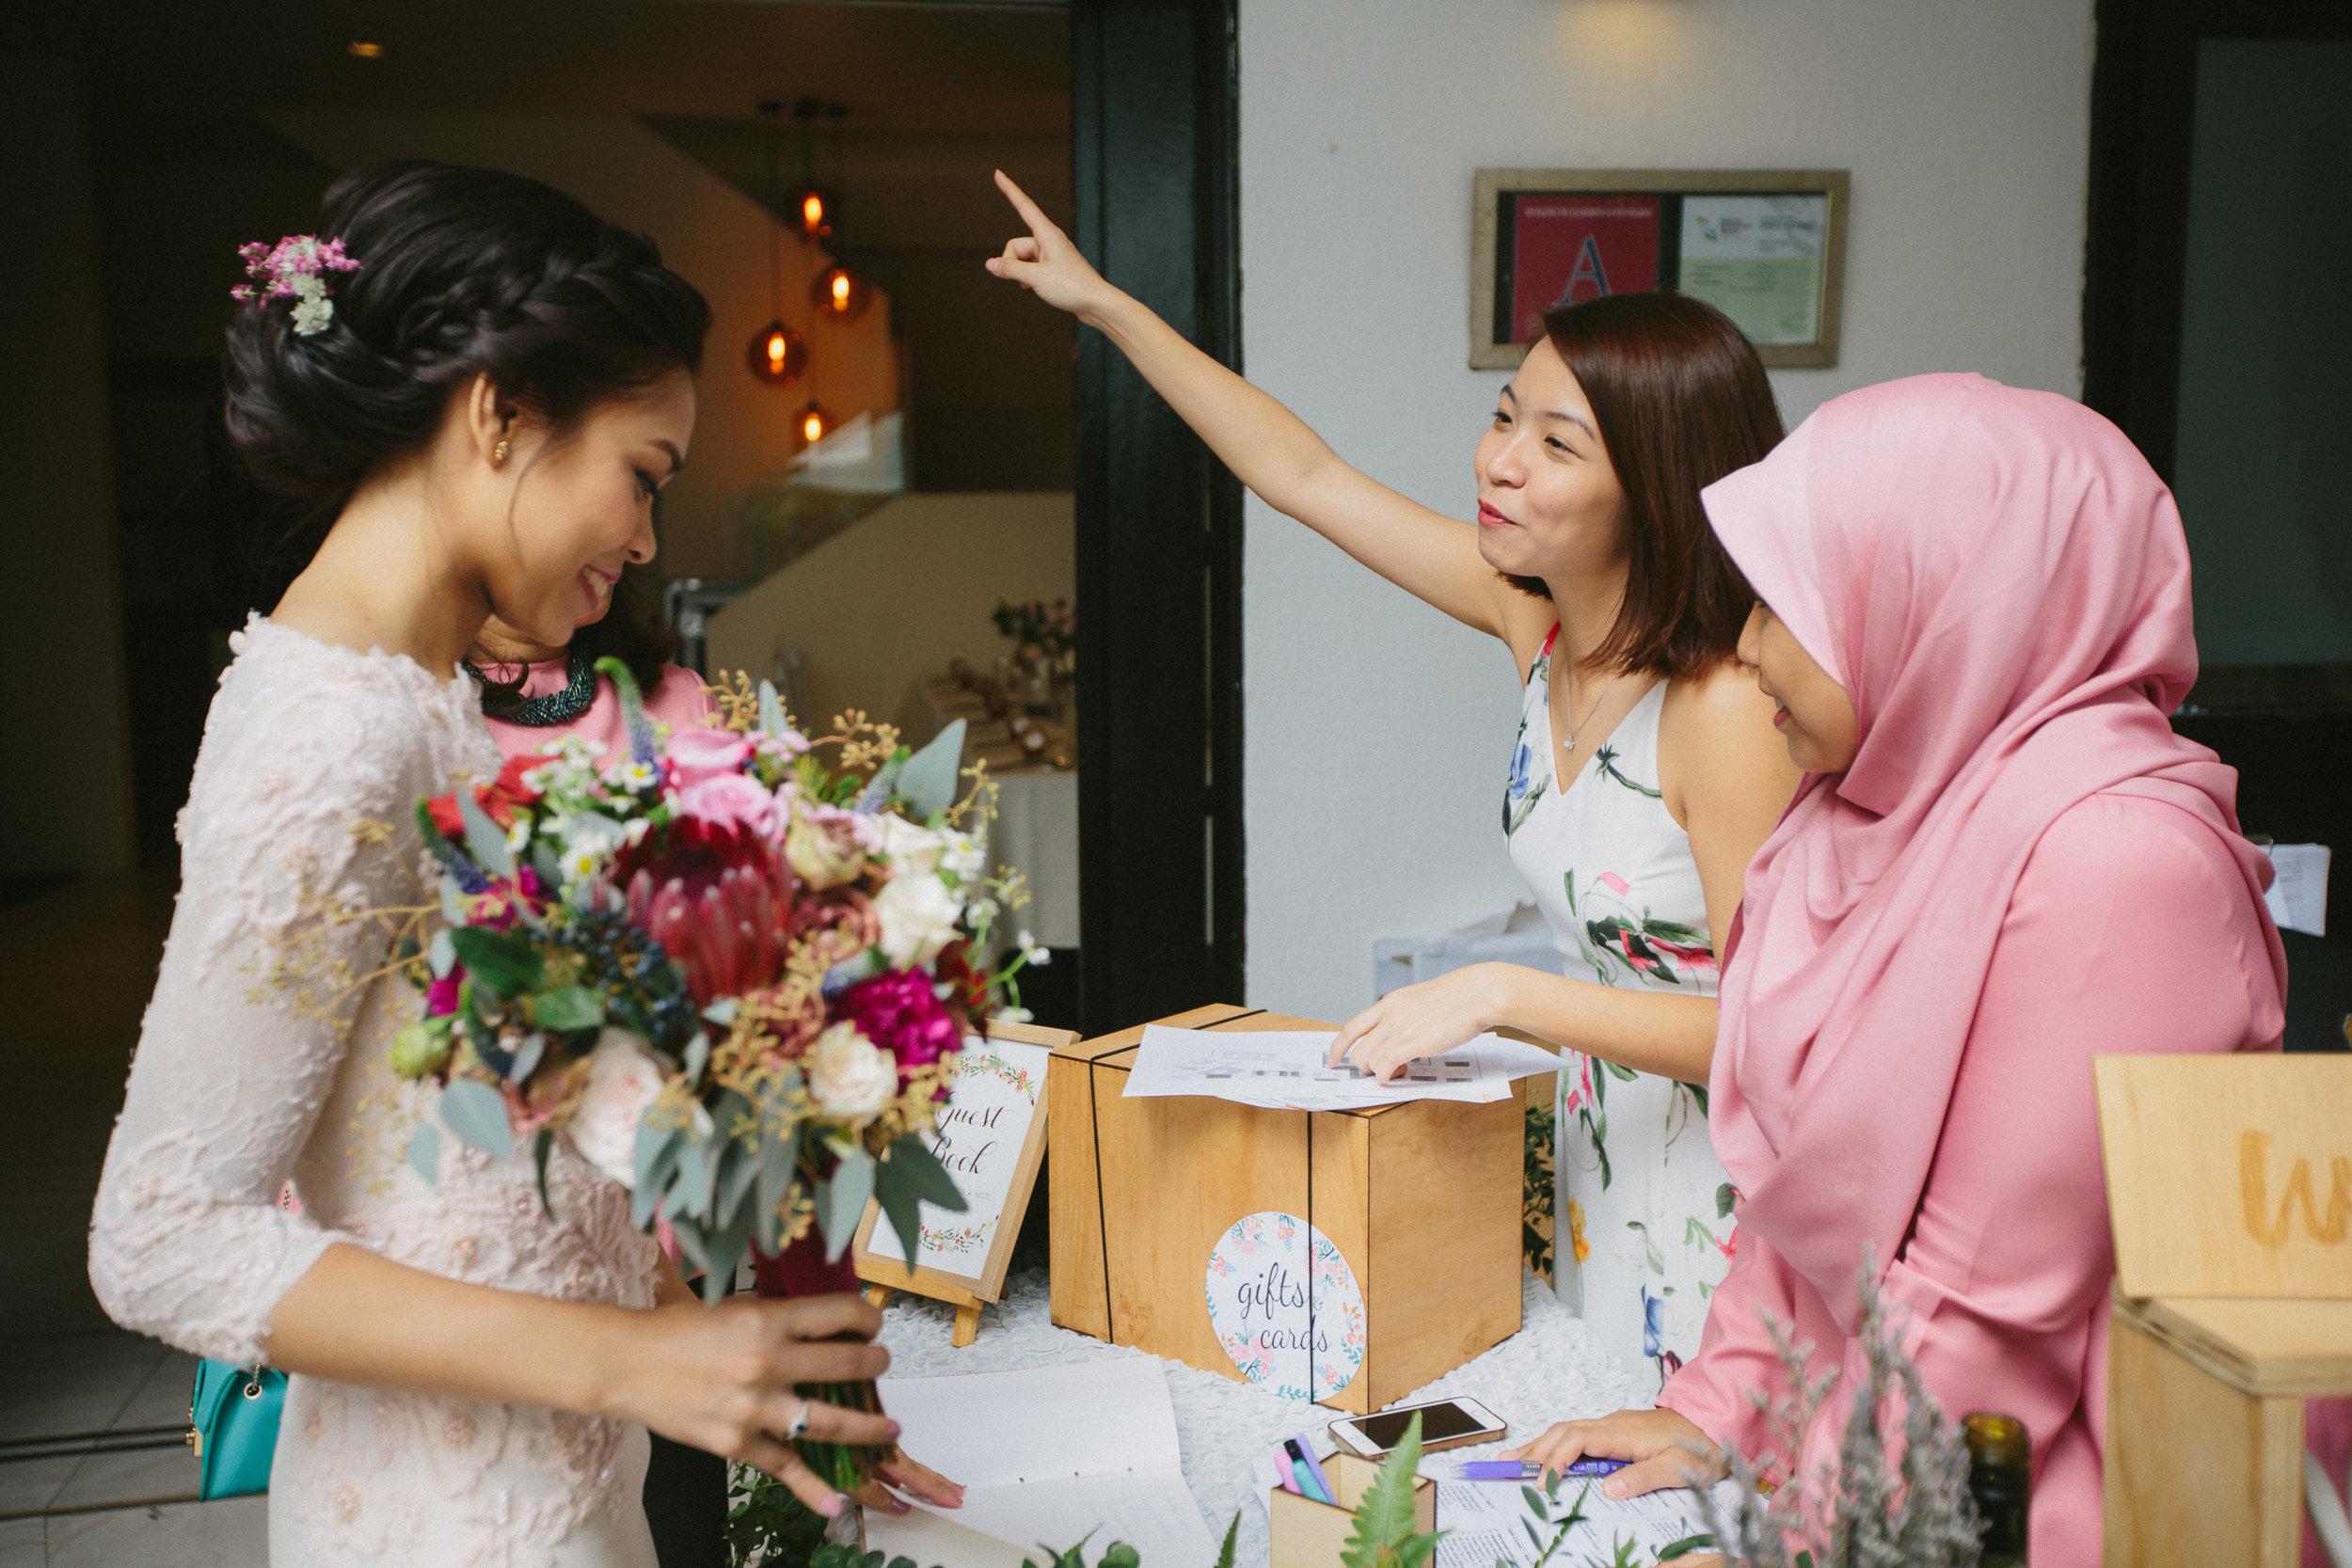 singapore-wedding-photographer-fadilah-kwan-012.jpg